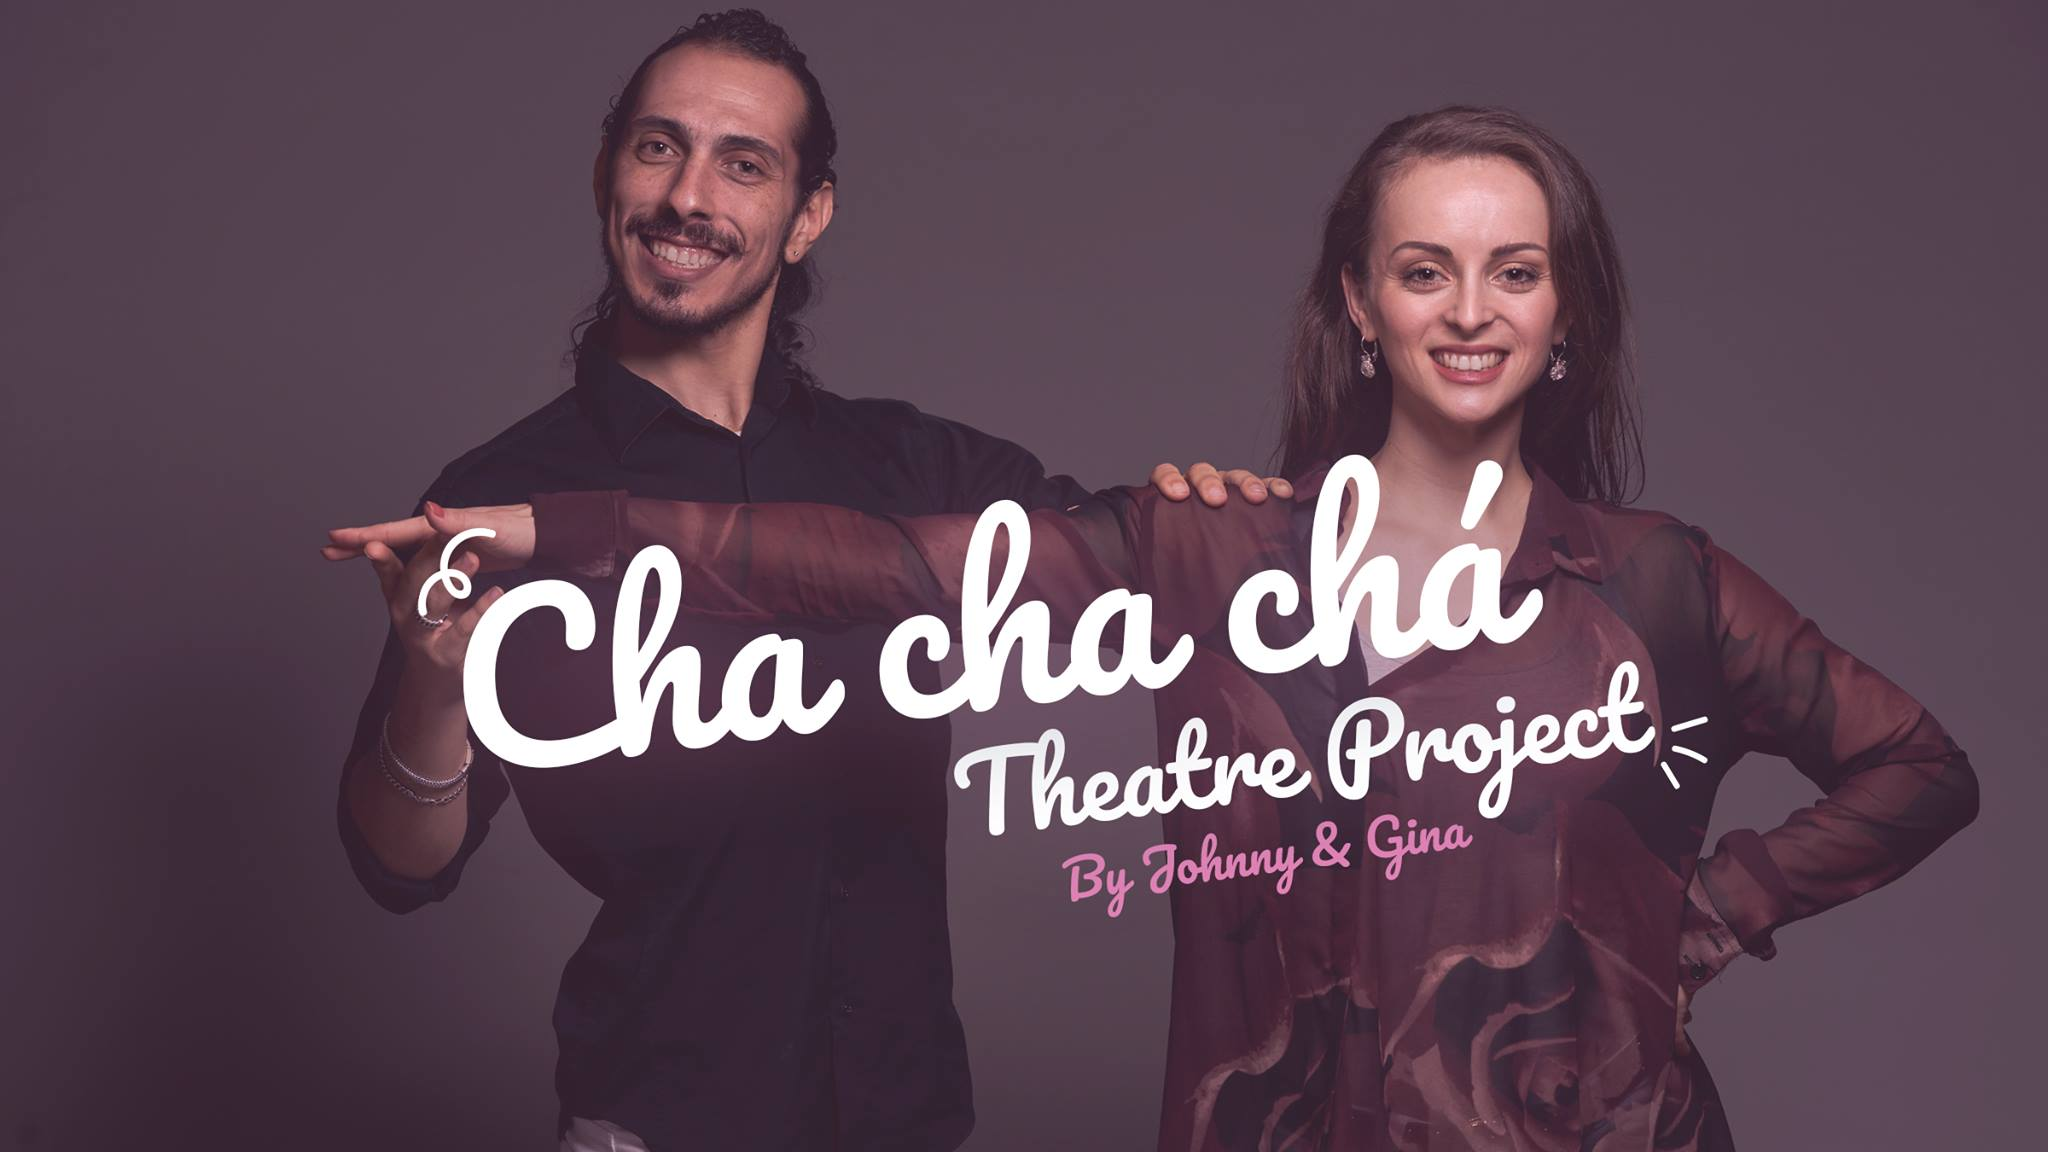 Cha Cha Chá Class & Theatre Project